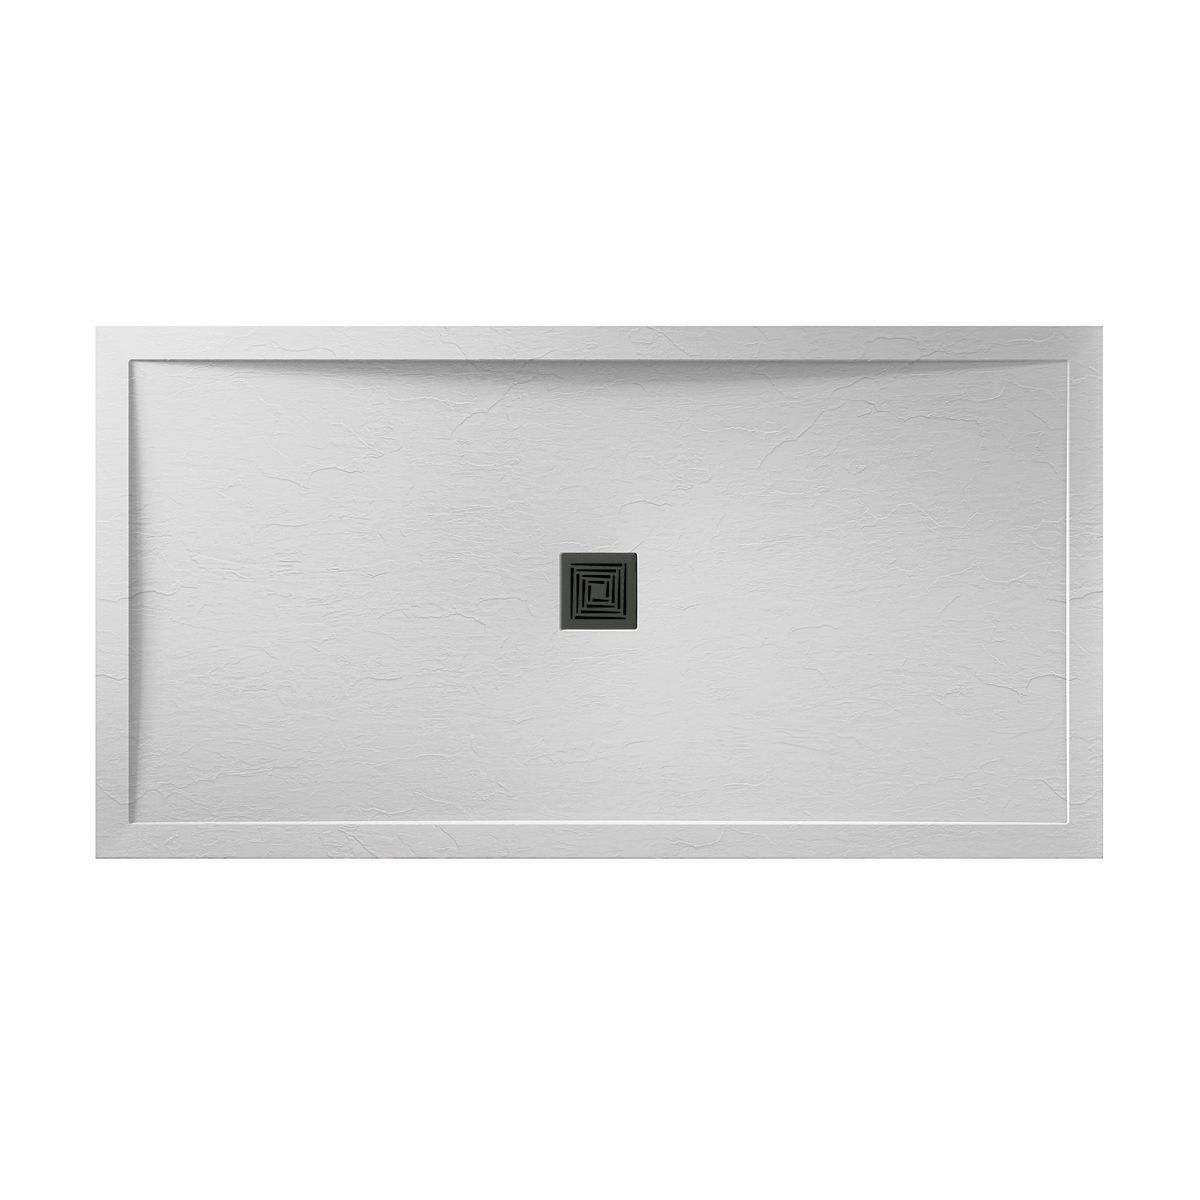 Aquadart White Slate Shower Tray 1400 x 800